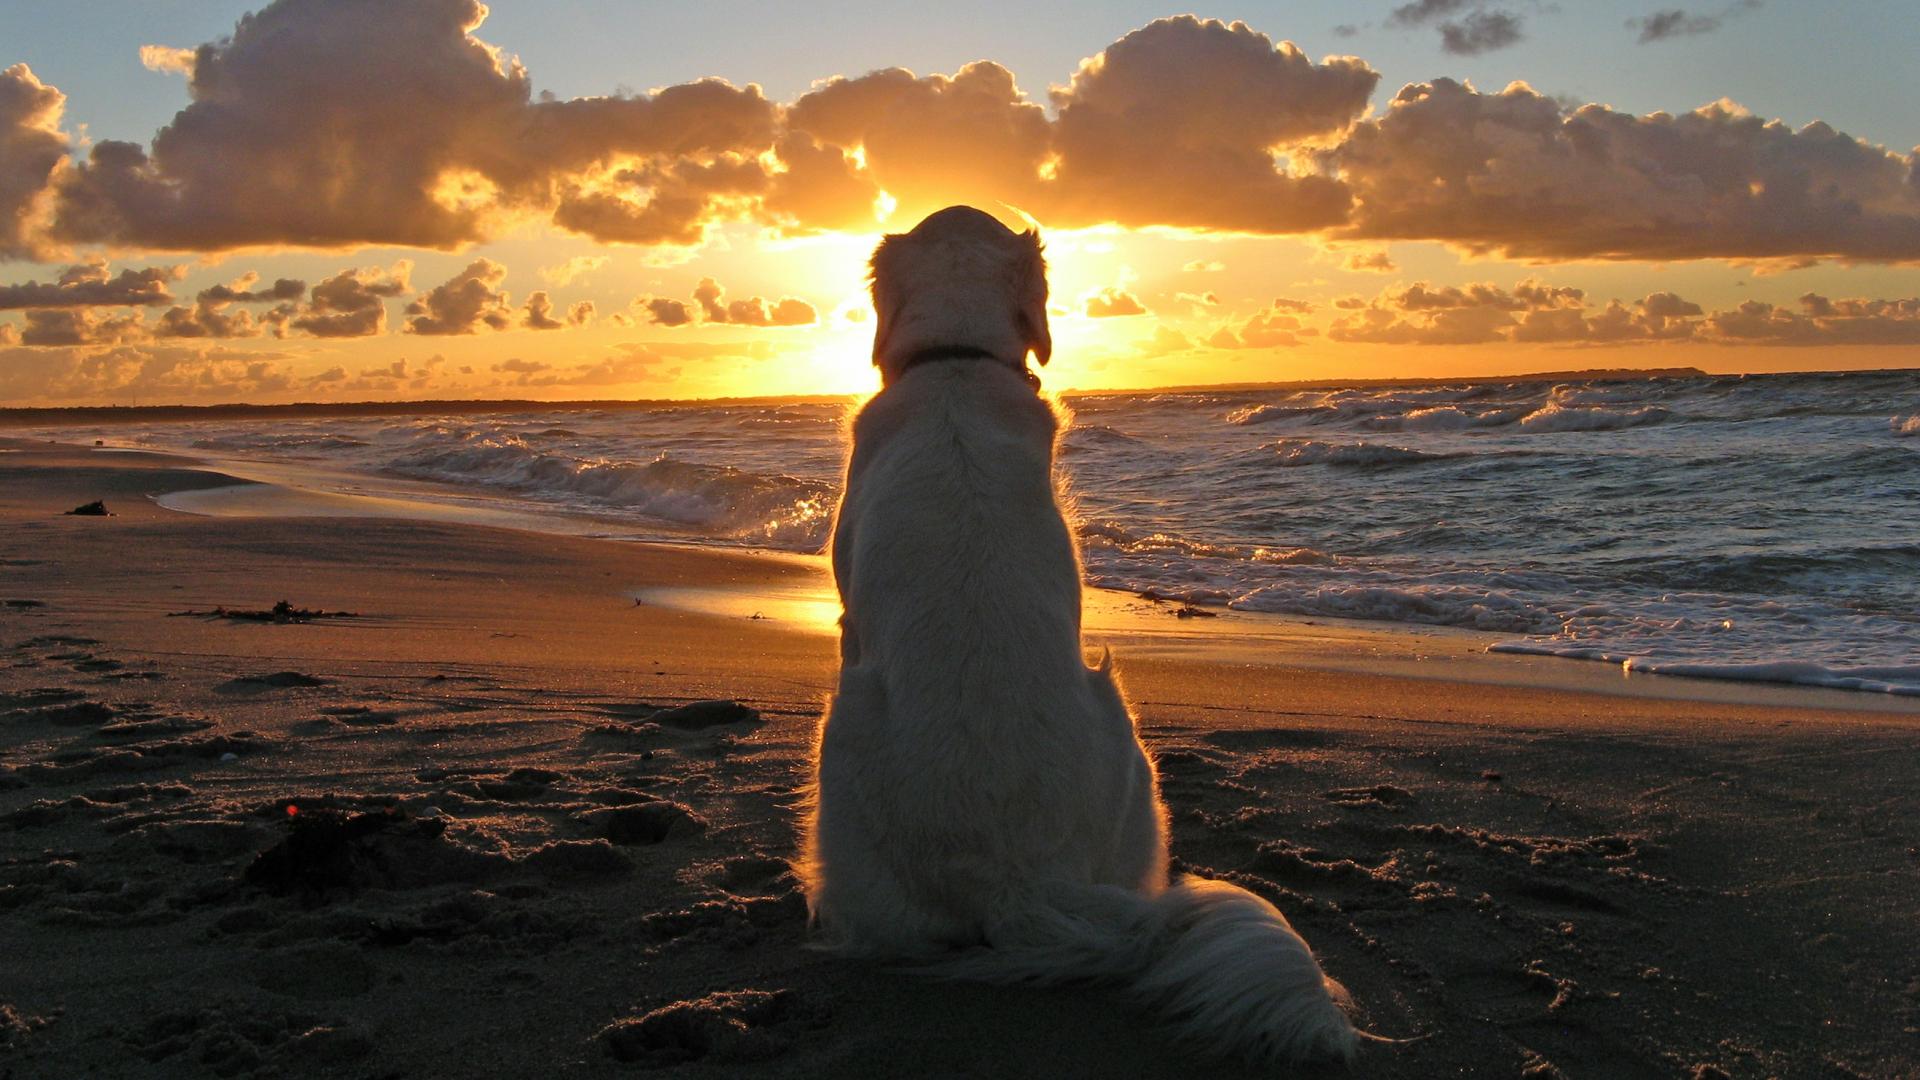 Animales - Perro  Fondo de Pantalla